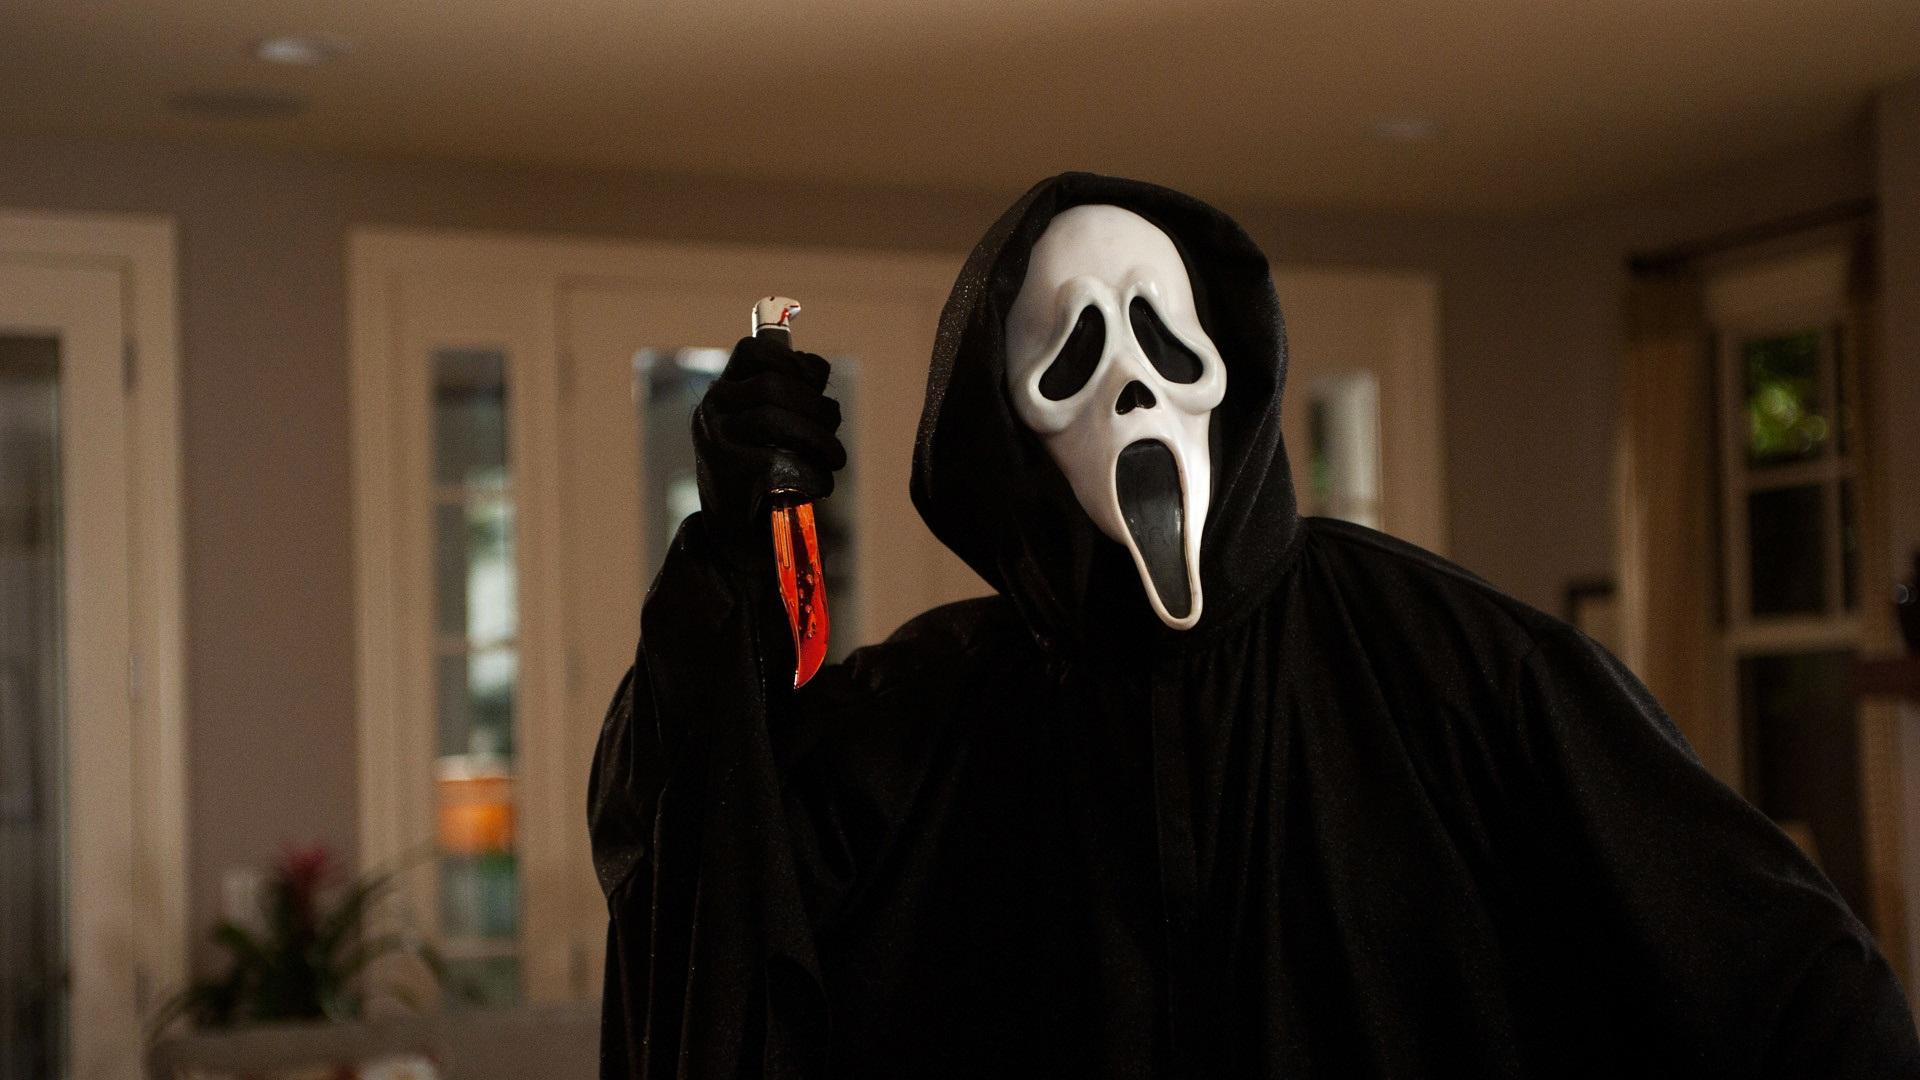 Films d'horreur - Qui qui c'est le + fort? Ghostface_in_scream-HD